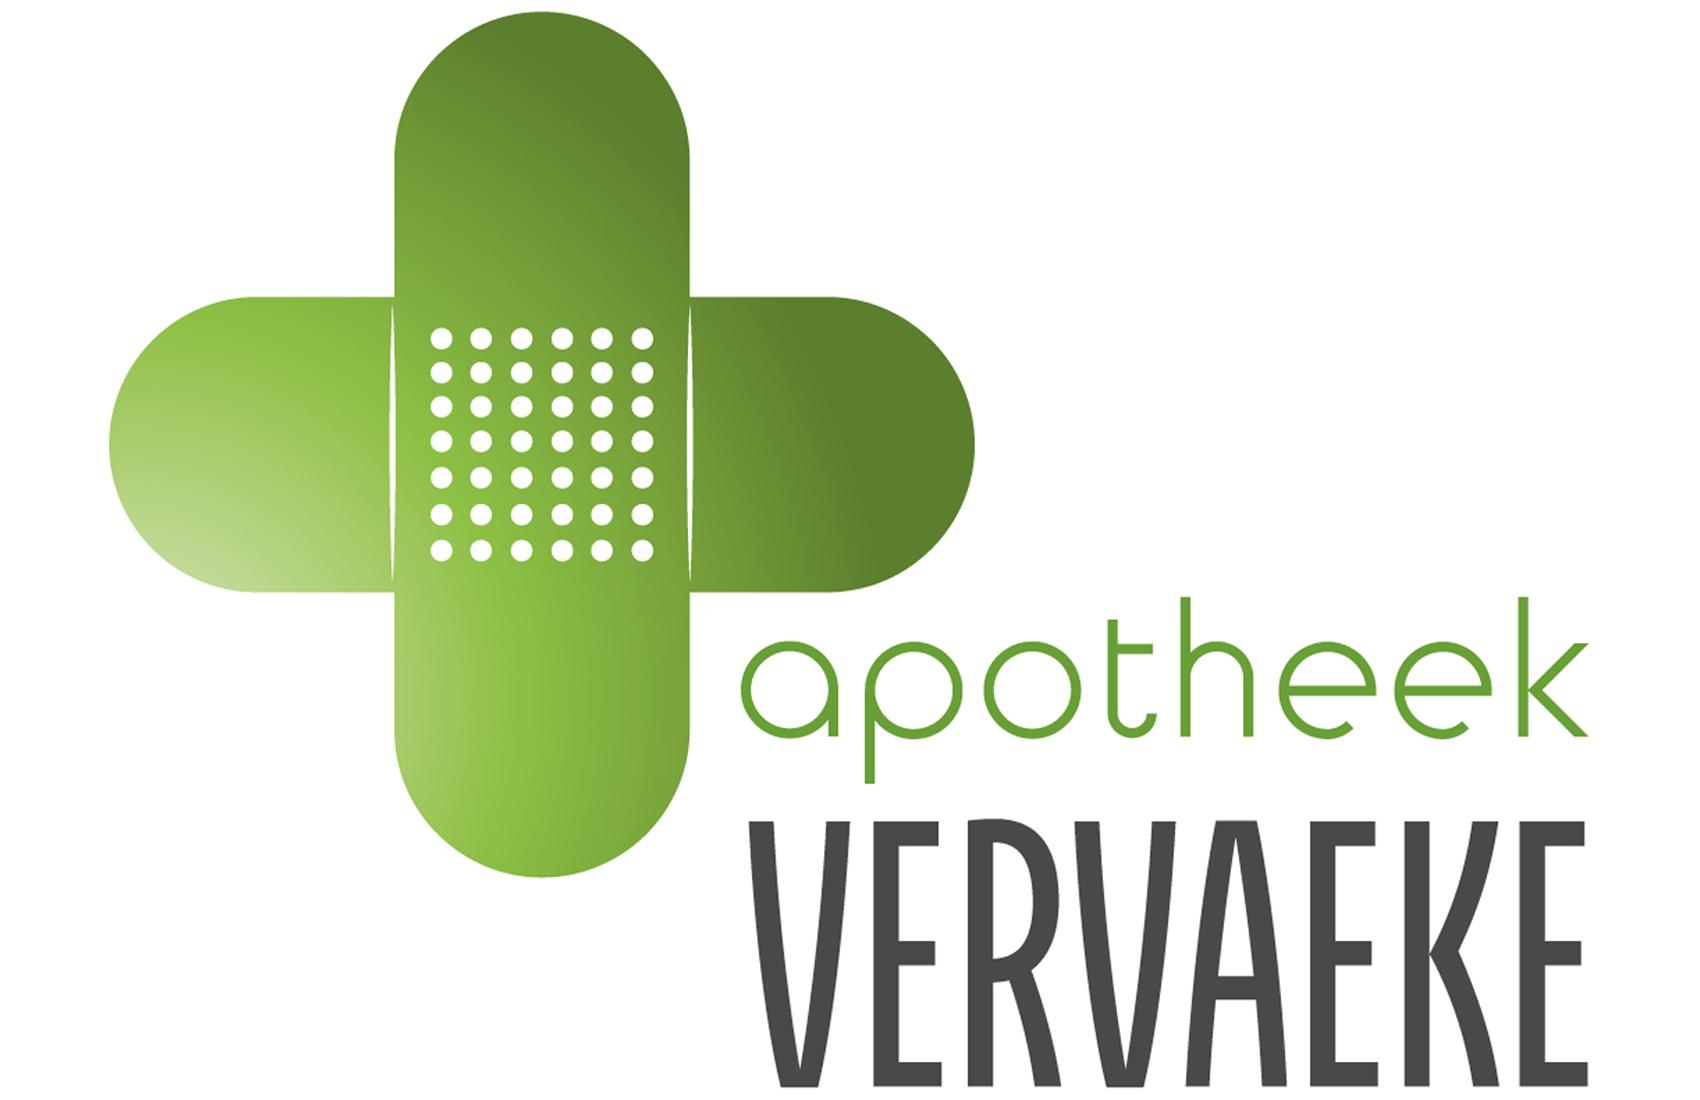 Apotheek Vervaeke